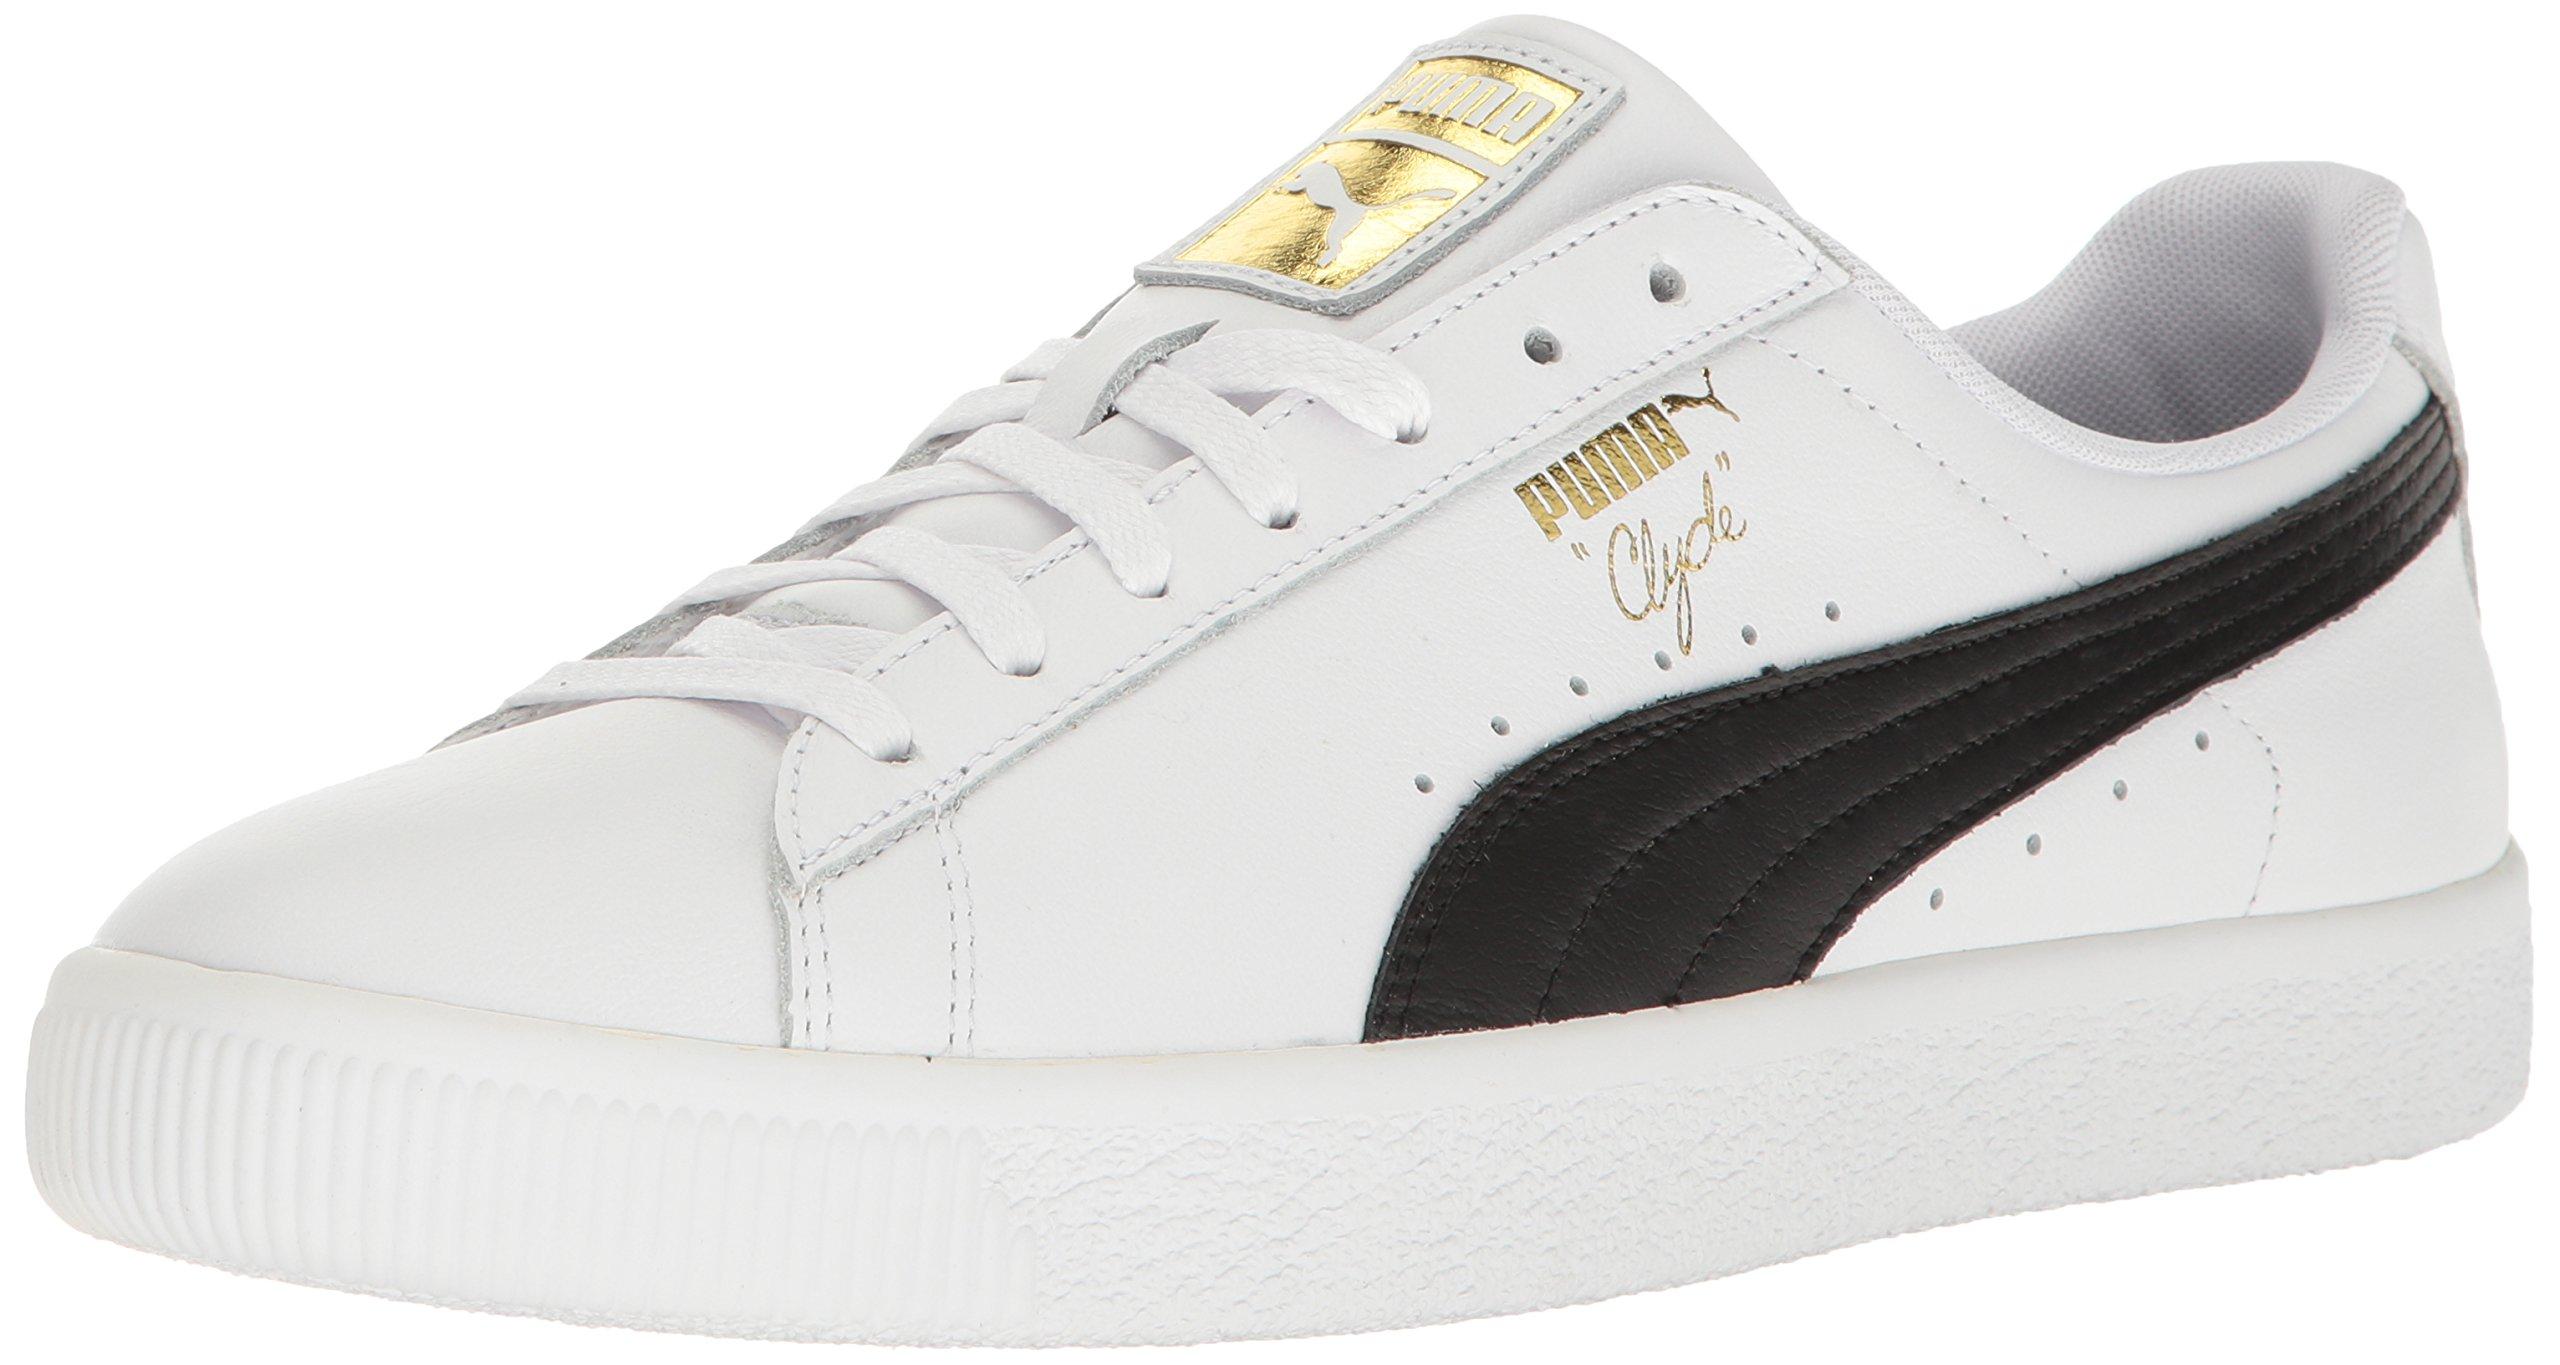 PUMA Men's Clyde Sneaker, White Blac, 7.5 M US